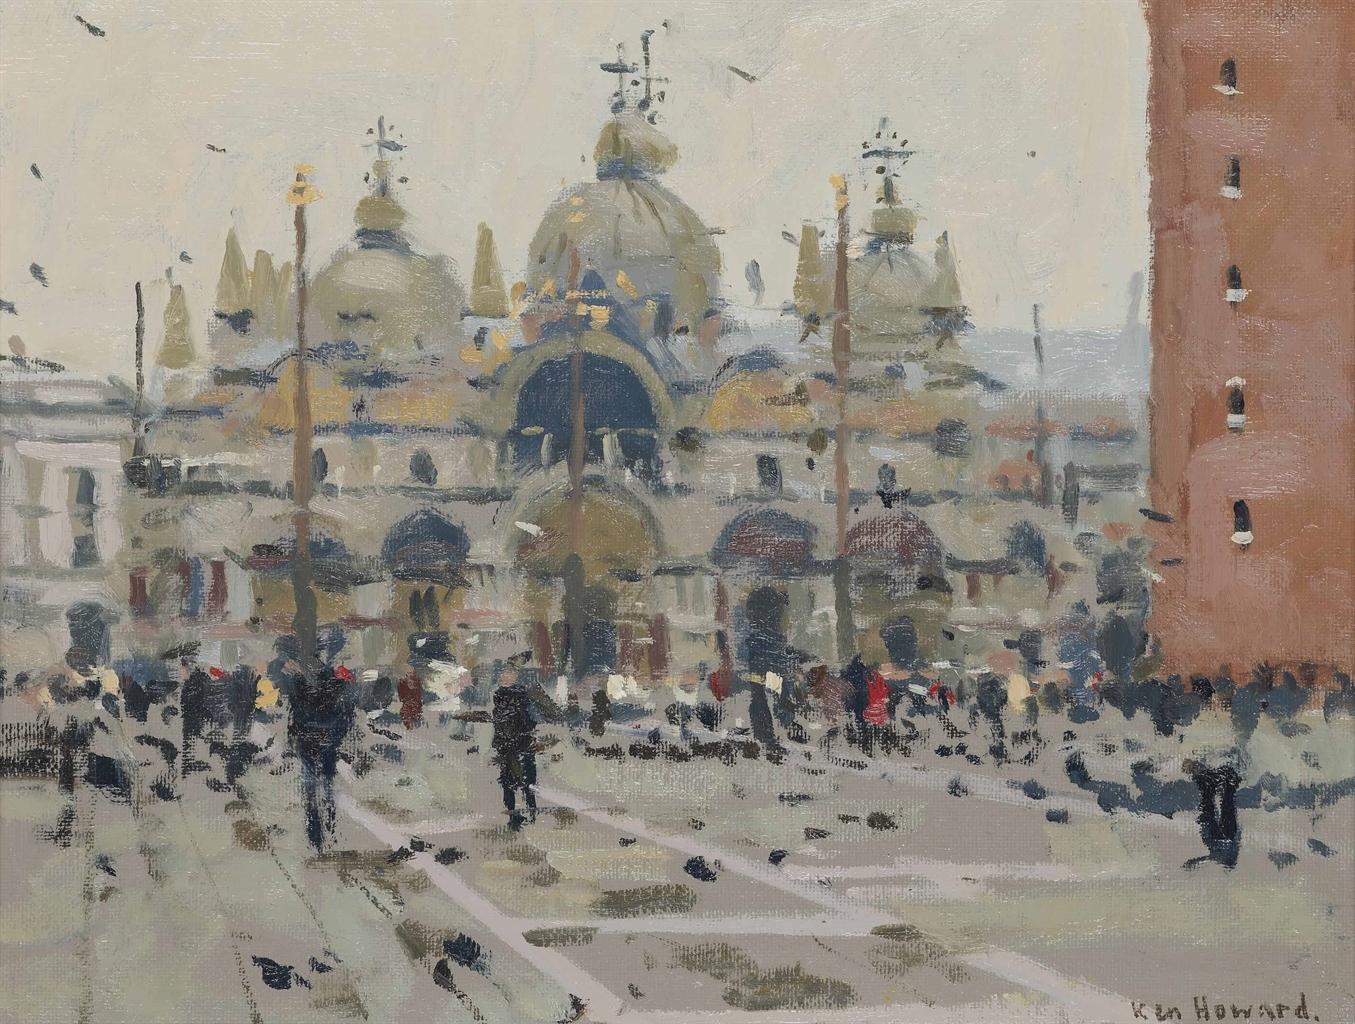 Ken Howard-San Marco-